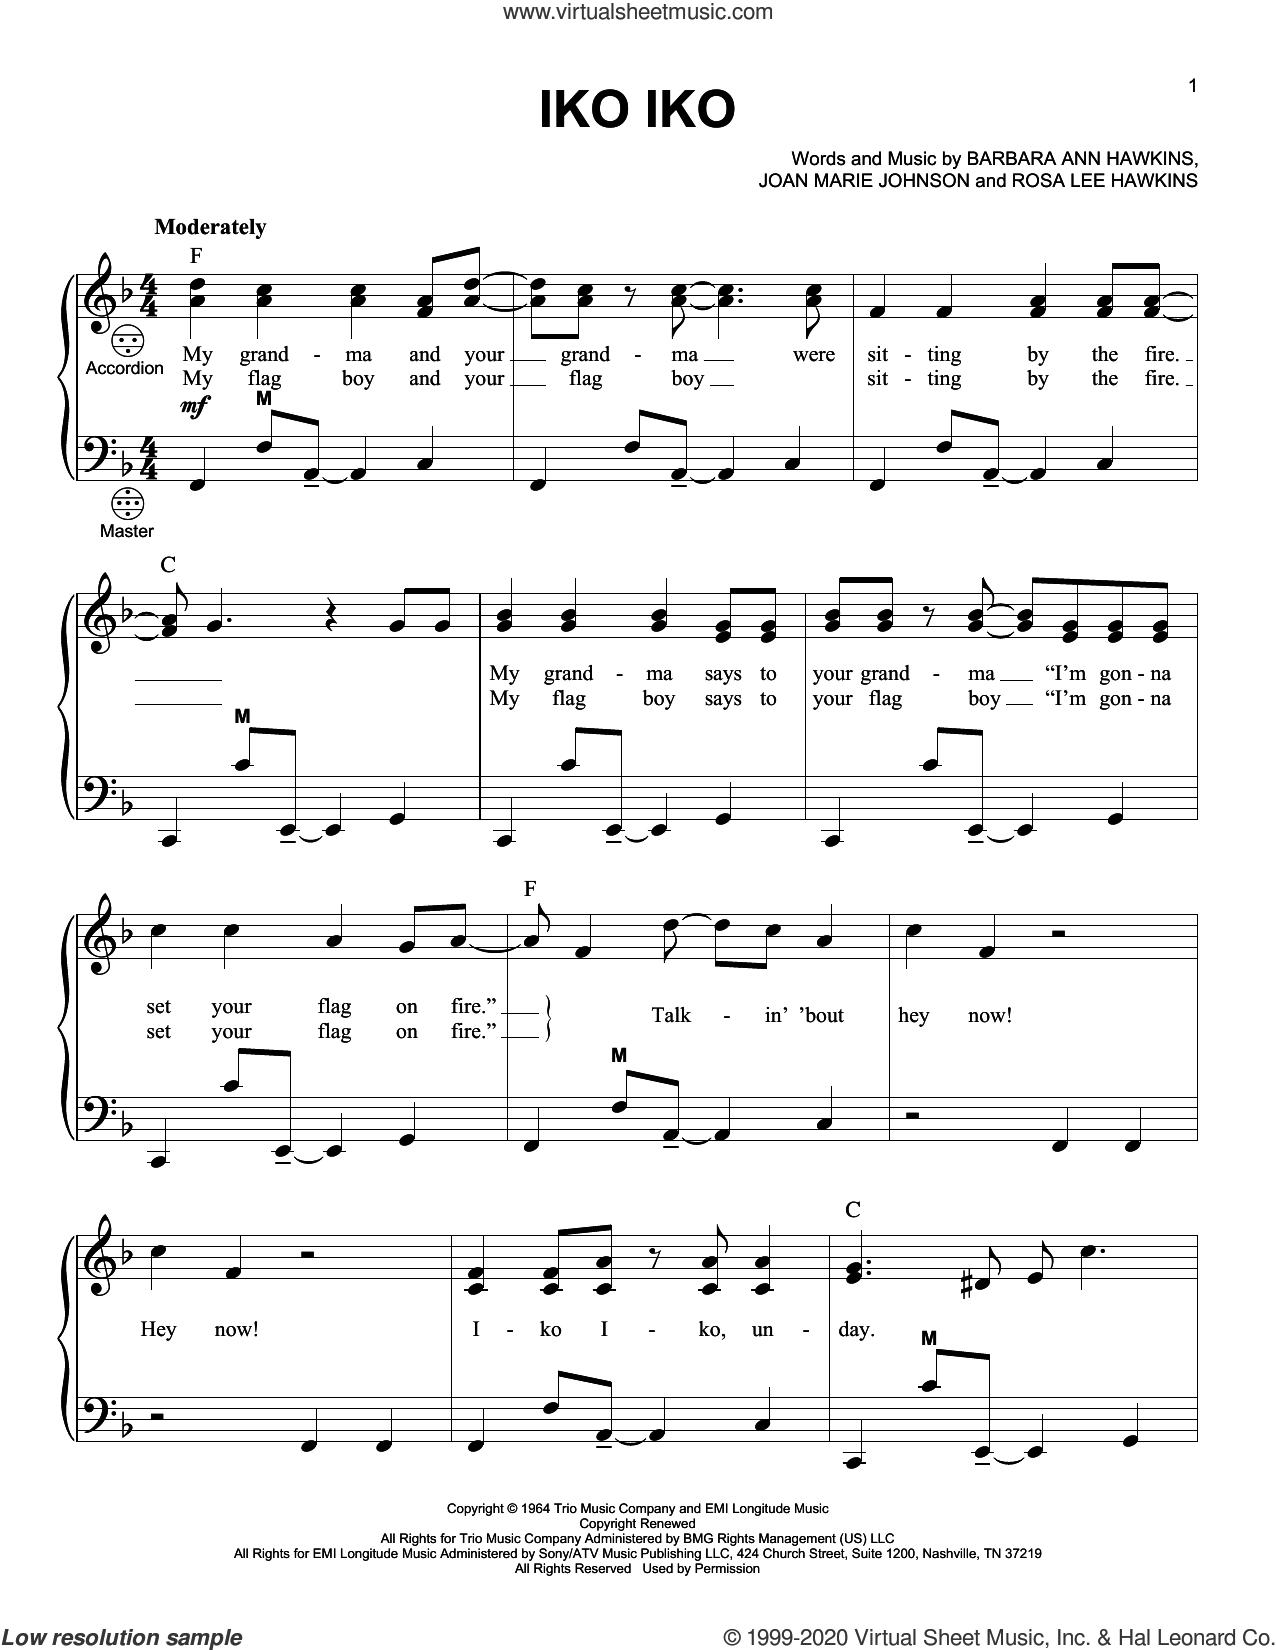 Iko Iko sheet music for accordion by The Dixie Cups, Barbara Ann Hawkins, Joan Marie Johnson and Rosa Lee Hawkins, intermediate skill level